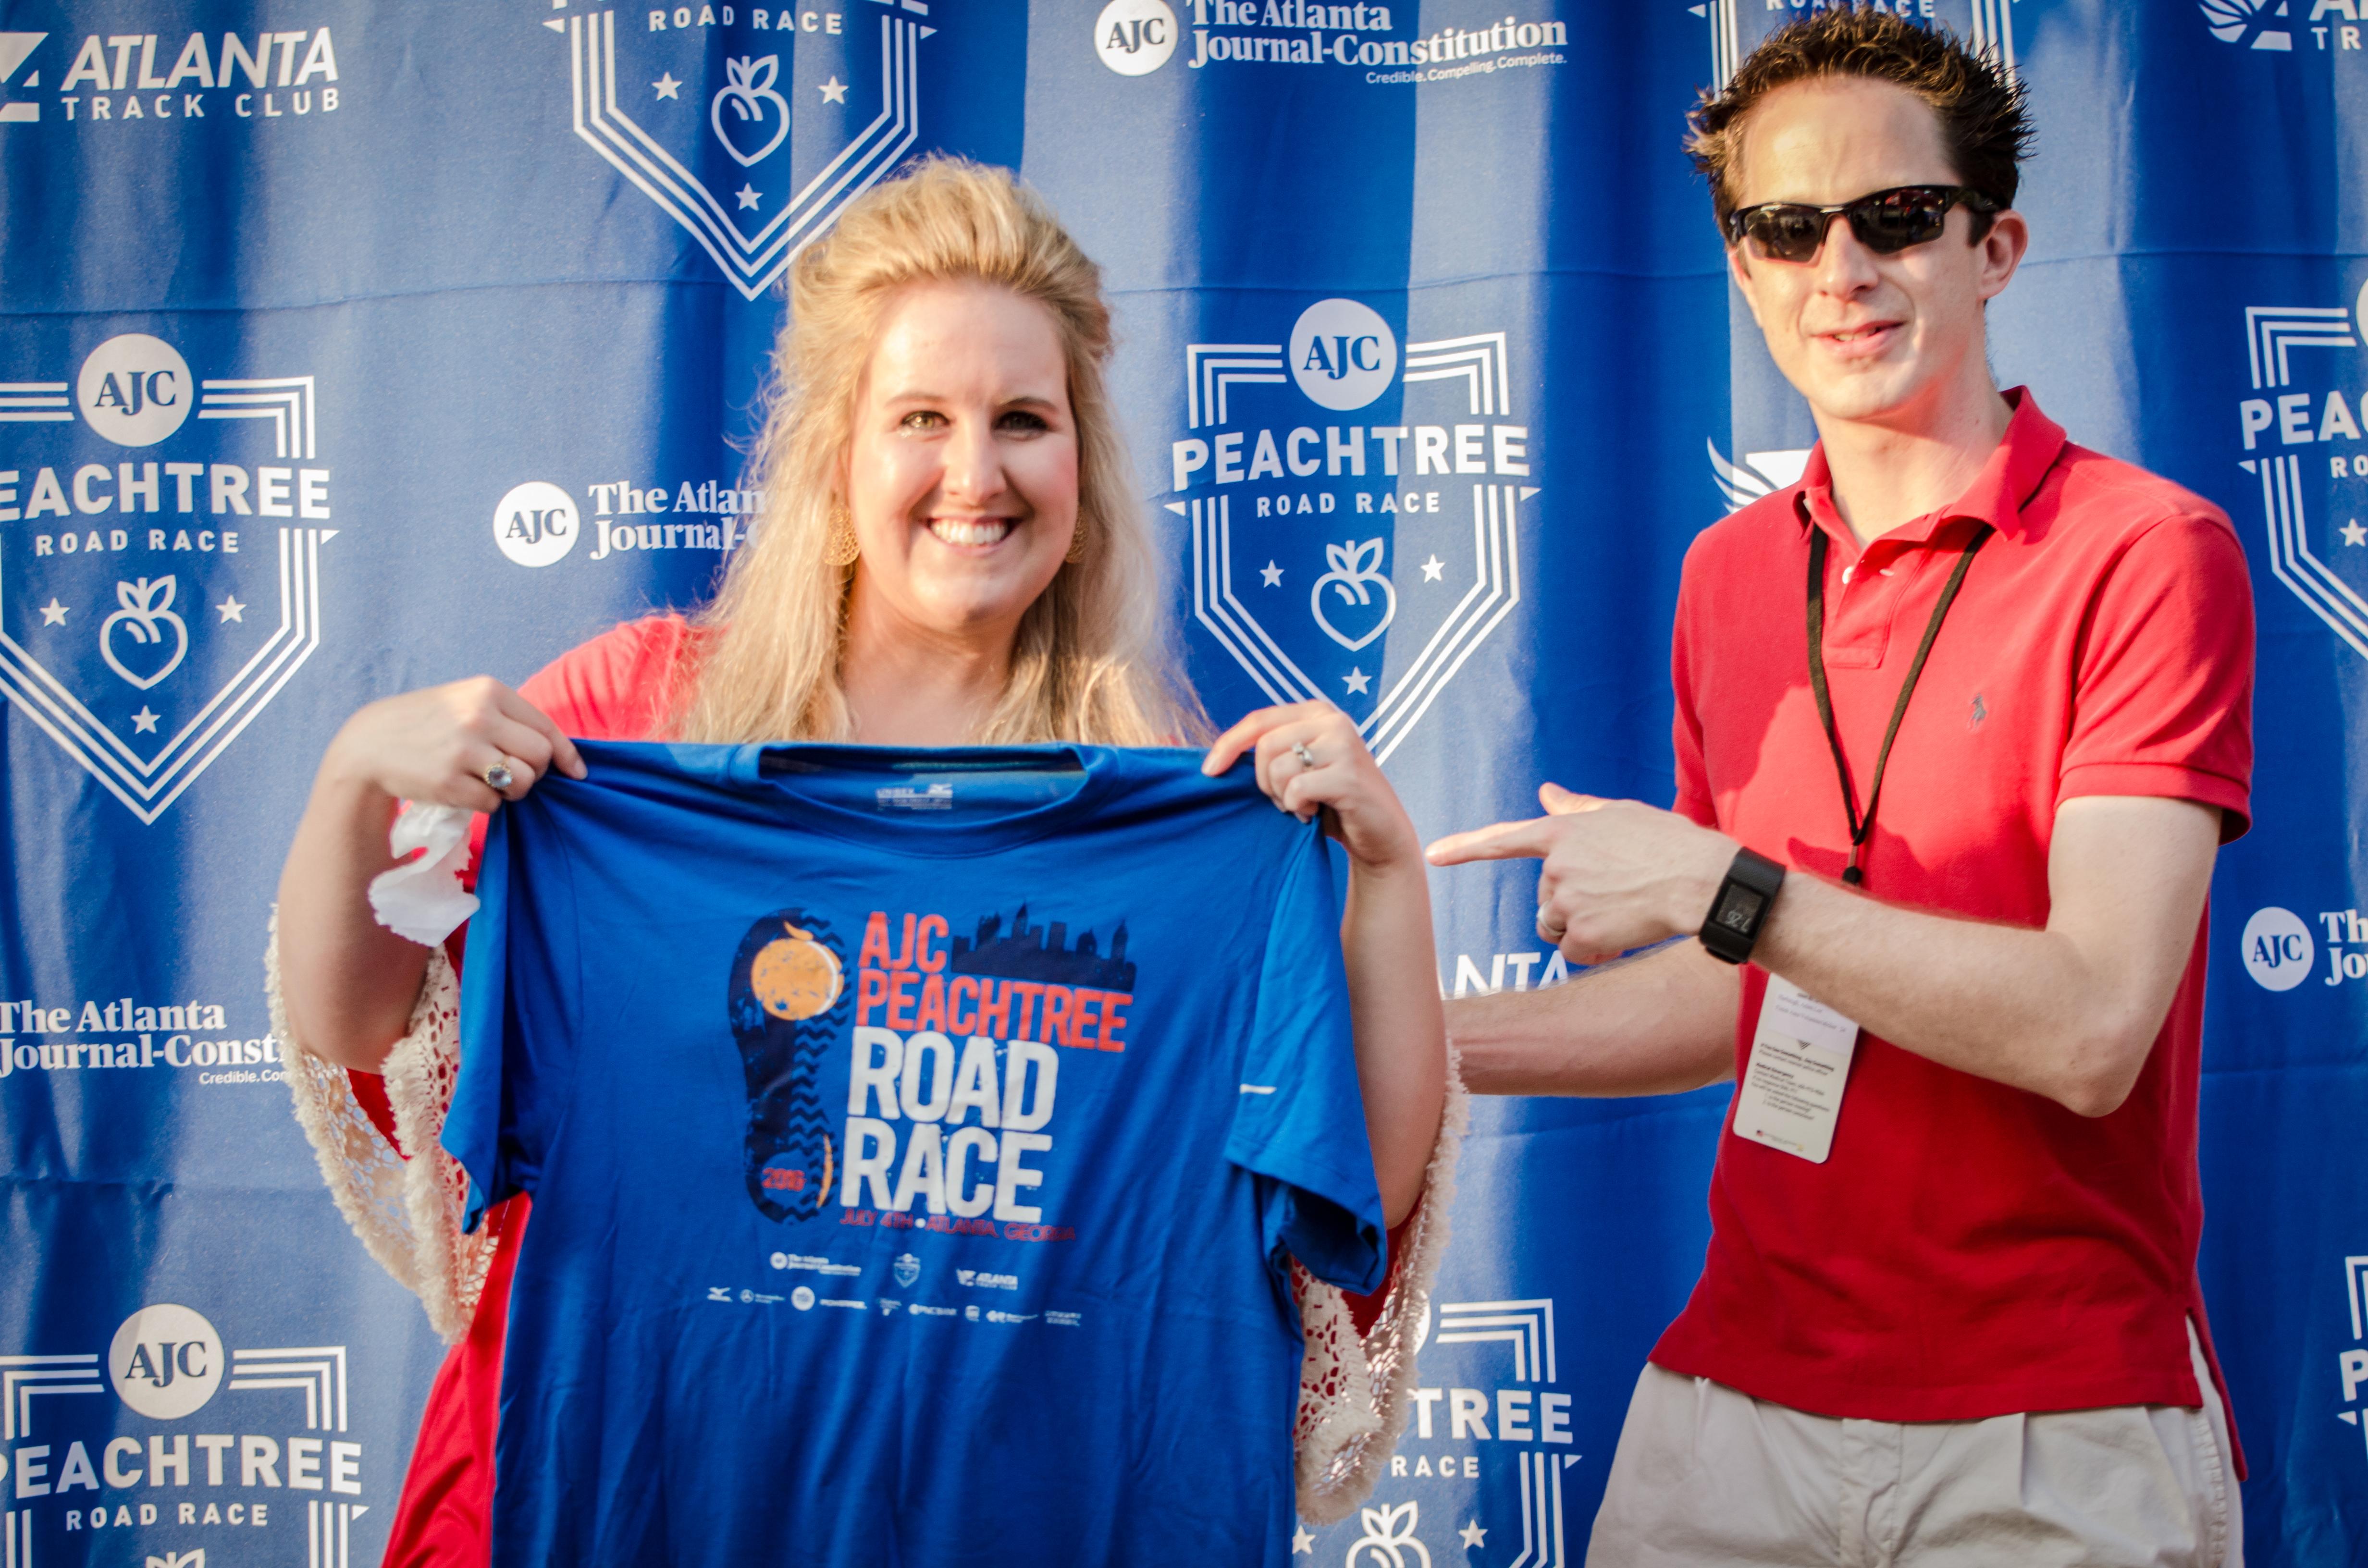 Peachtree_Road_Race_2016-2